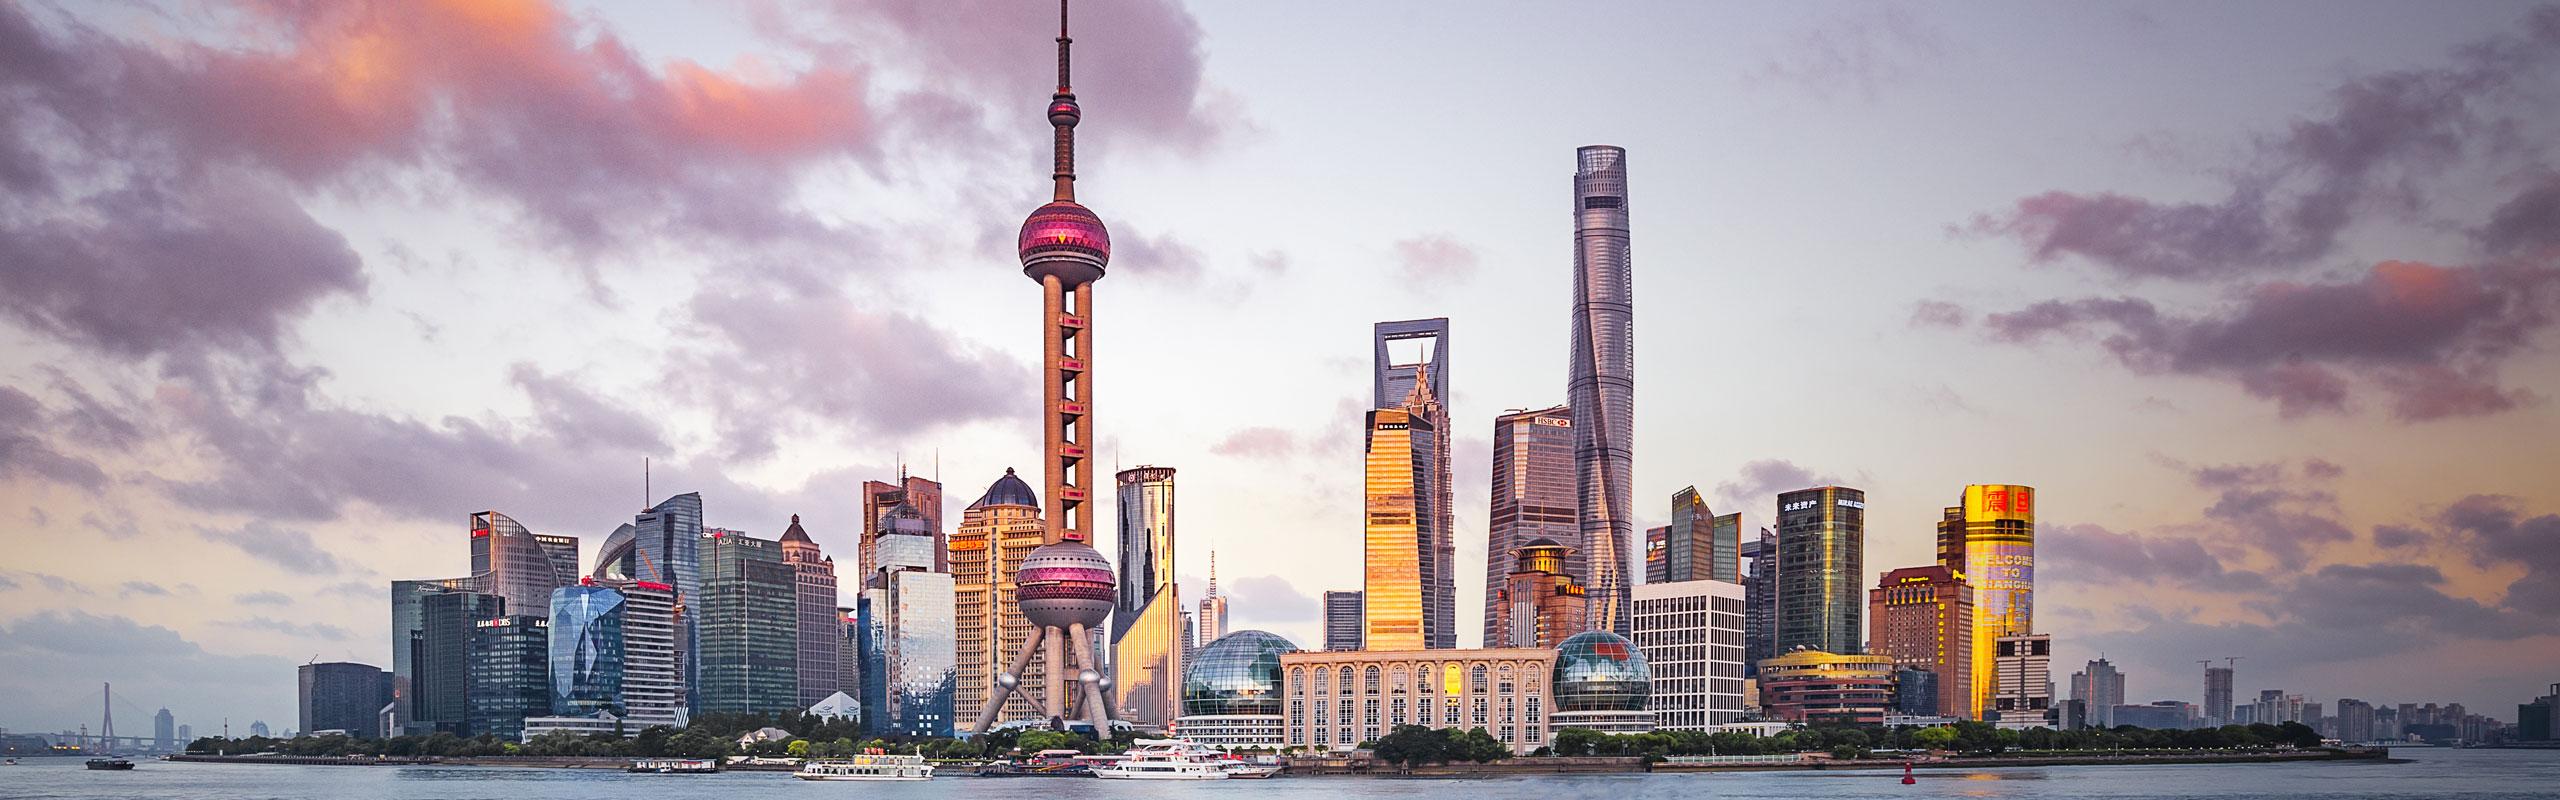 China City Guide